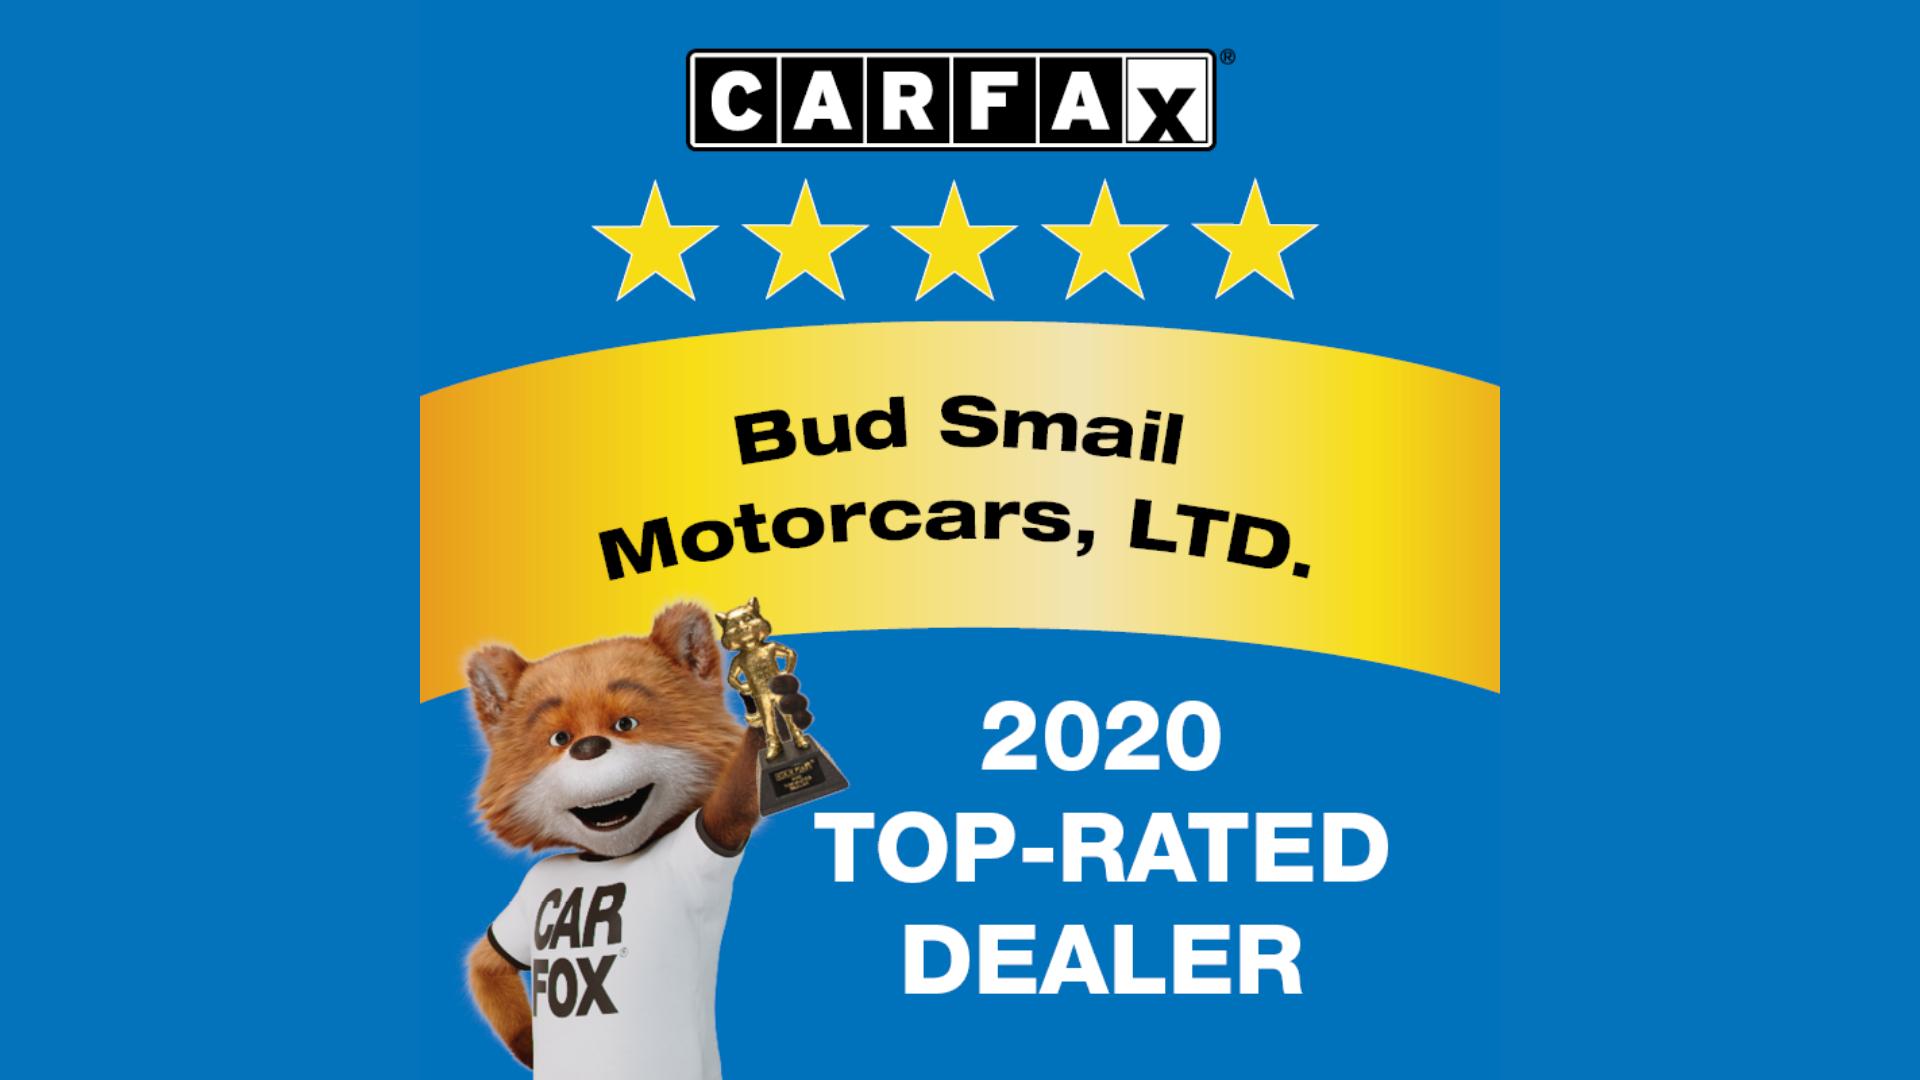 Mercedes Top-Rated Dealer Award